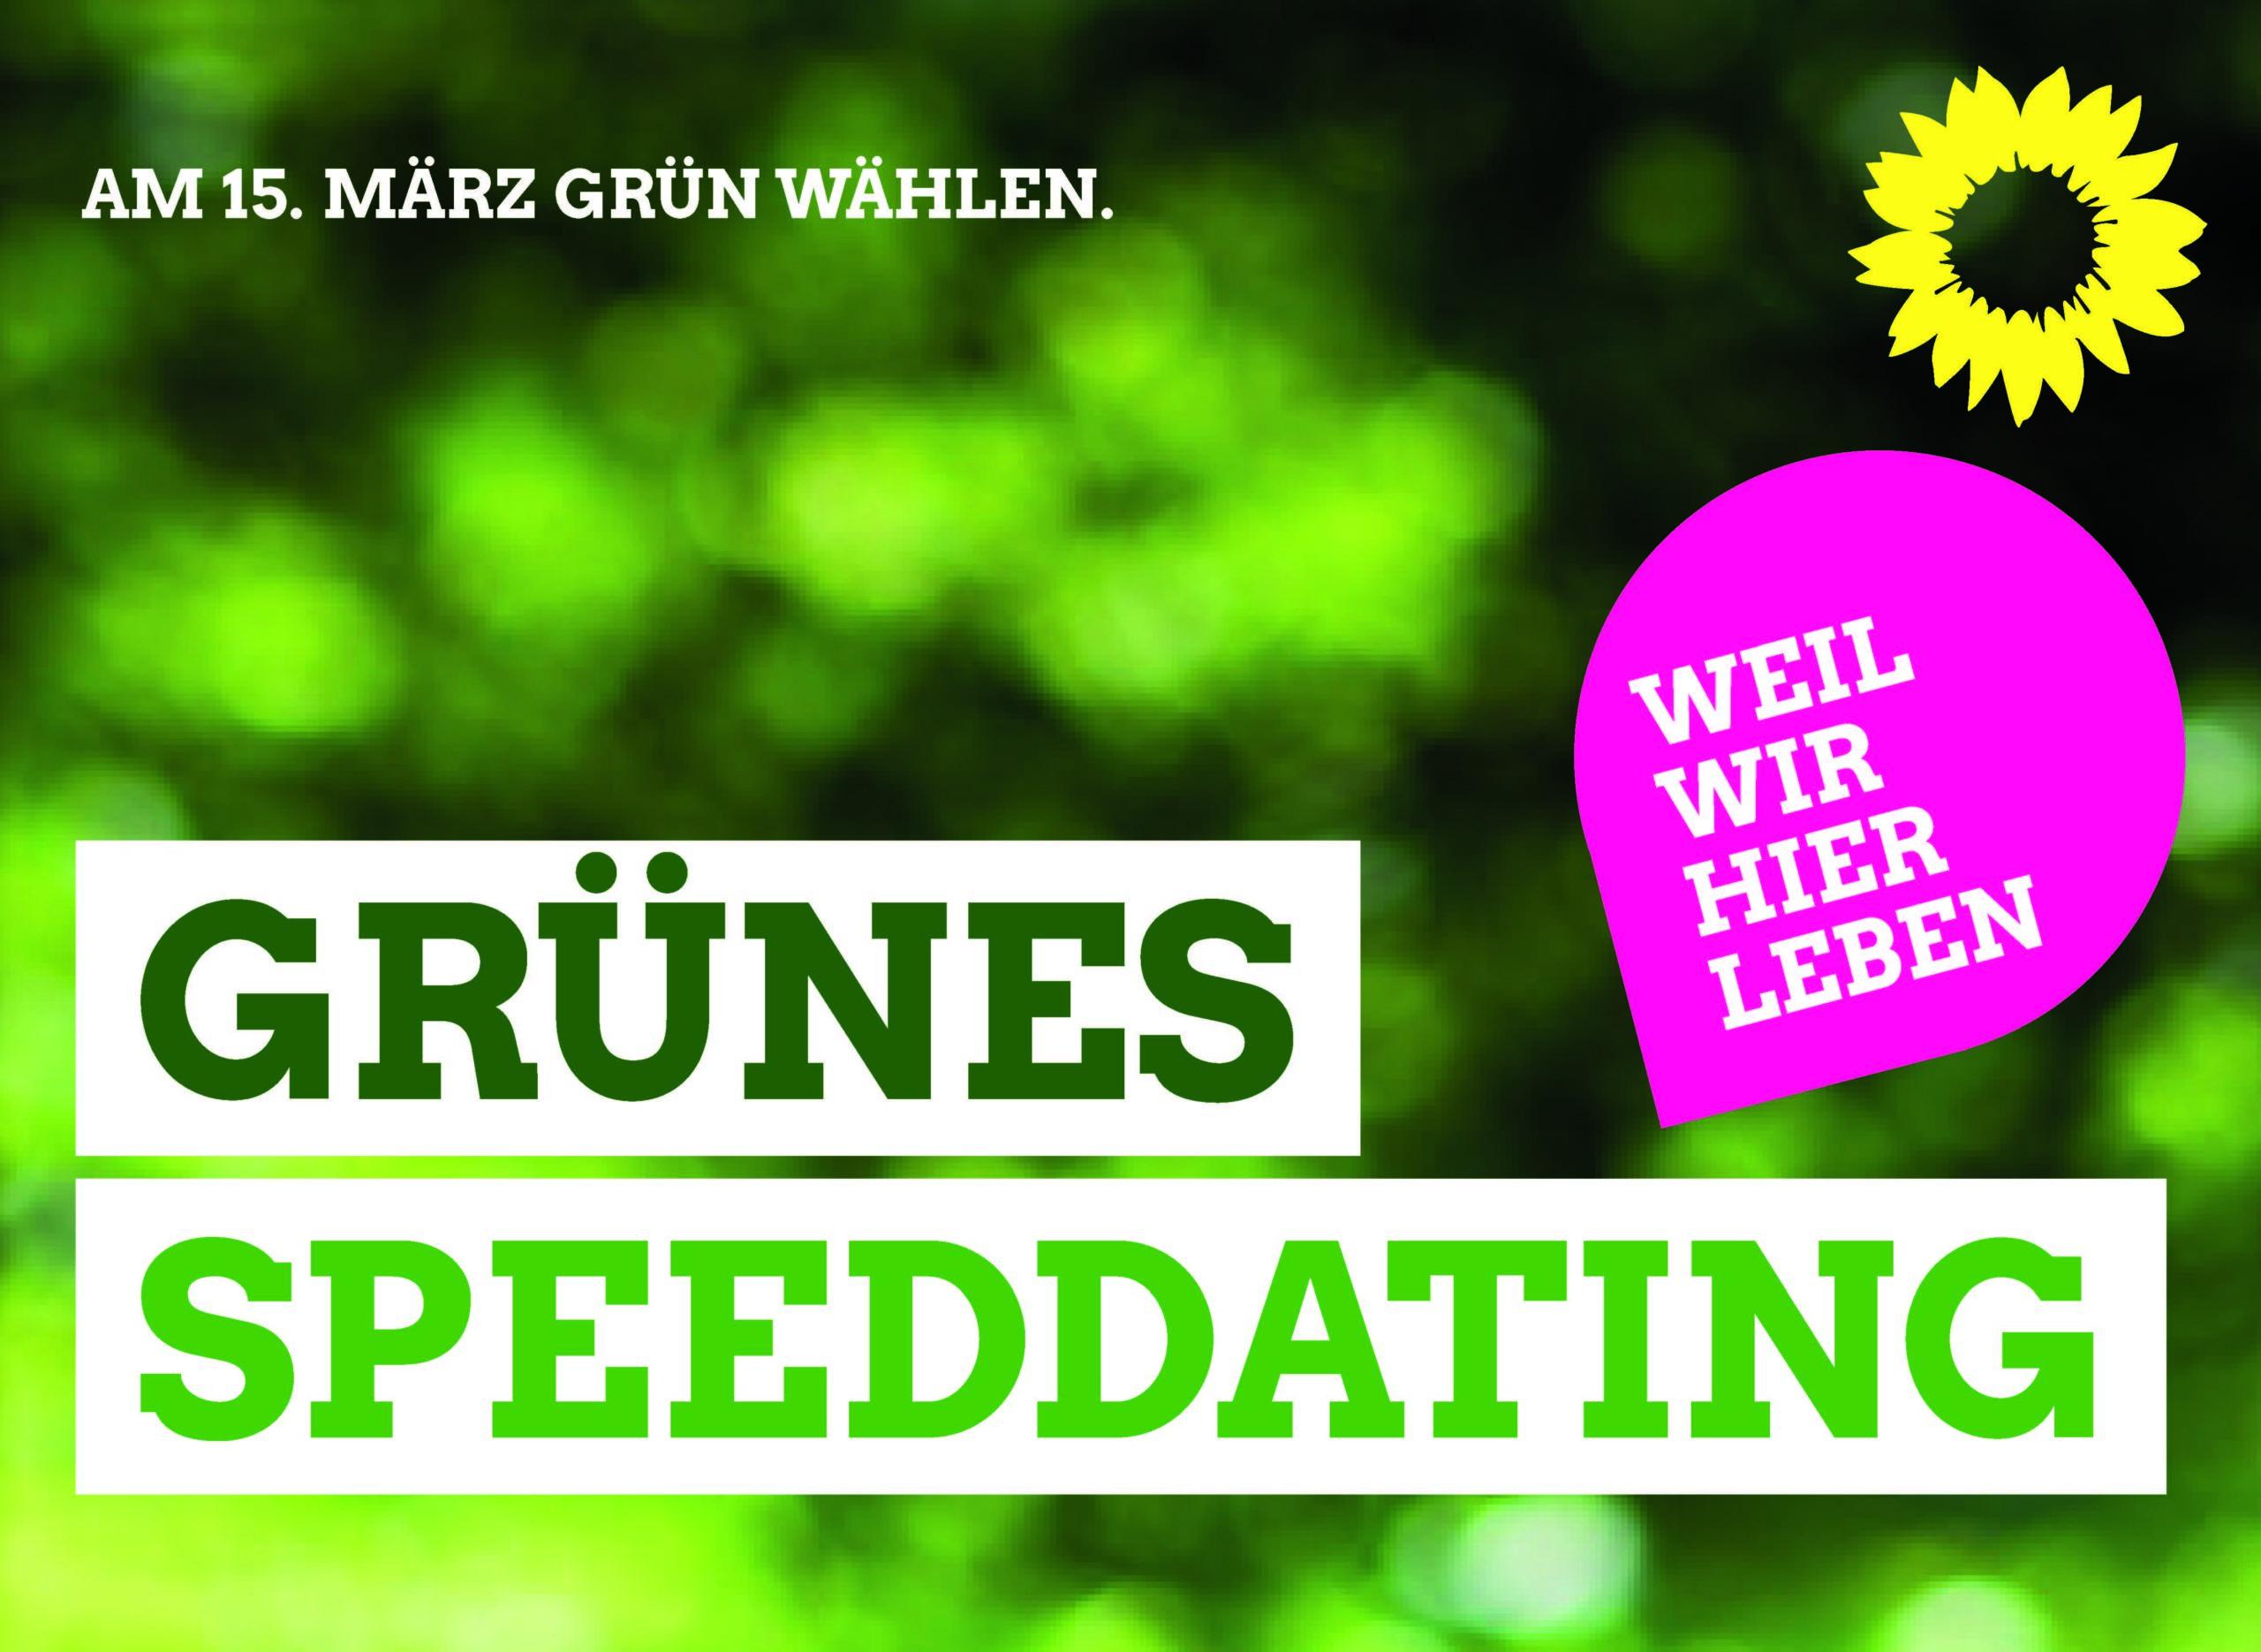 GRÜNES SPEEDDATING